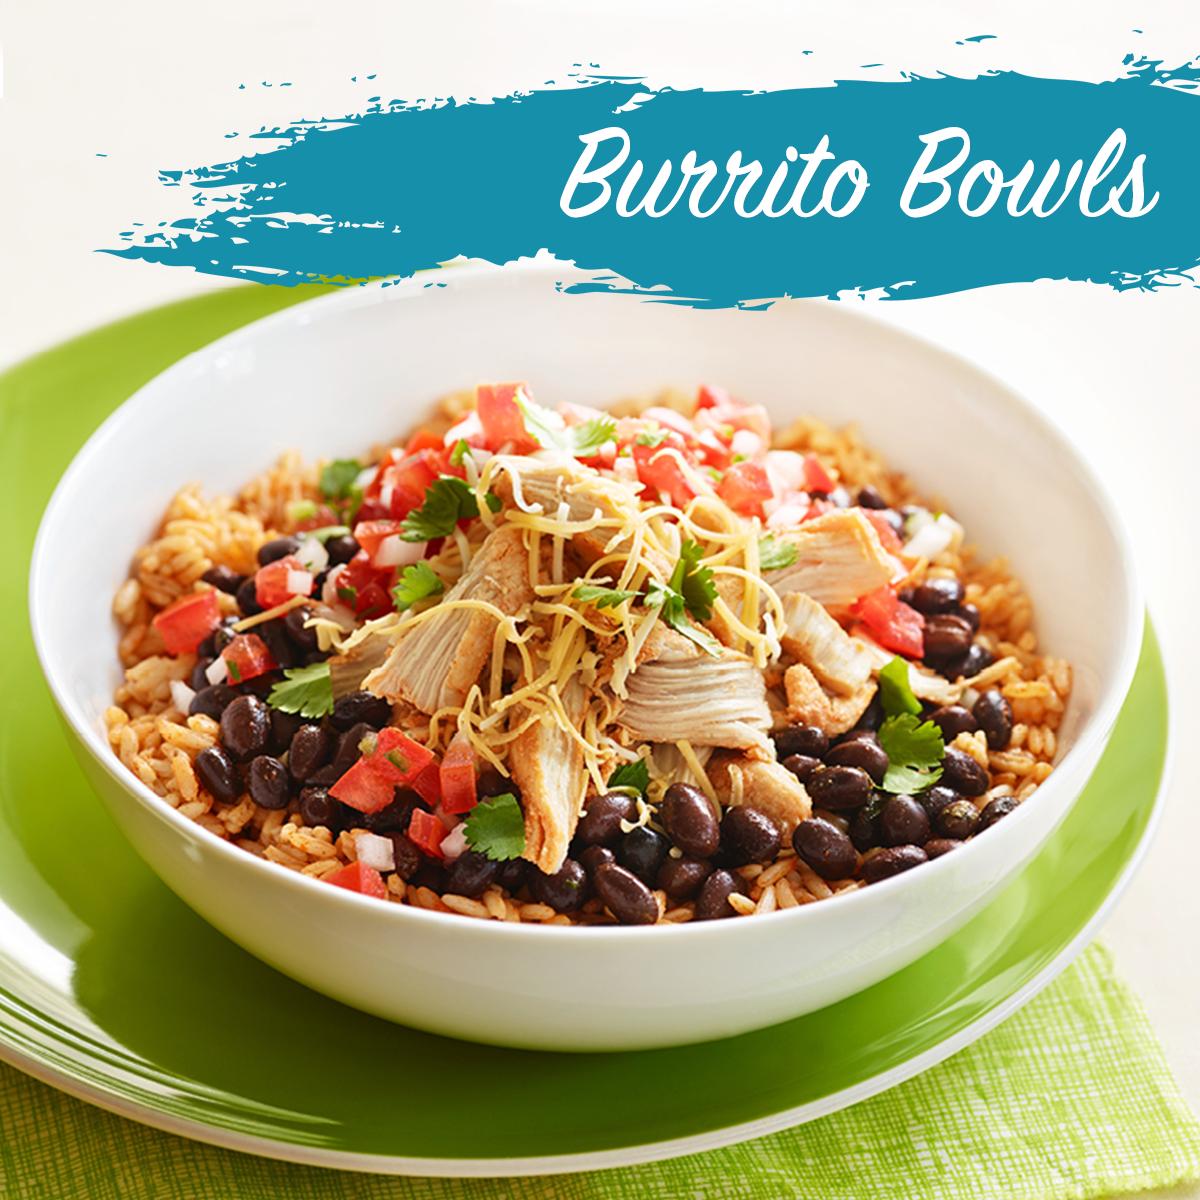 Burrito clipart burrito bowl. Menu taco del mar